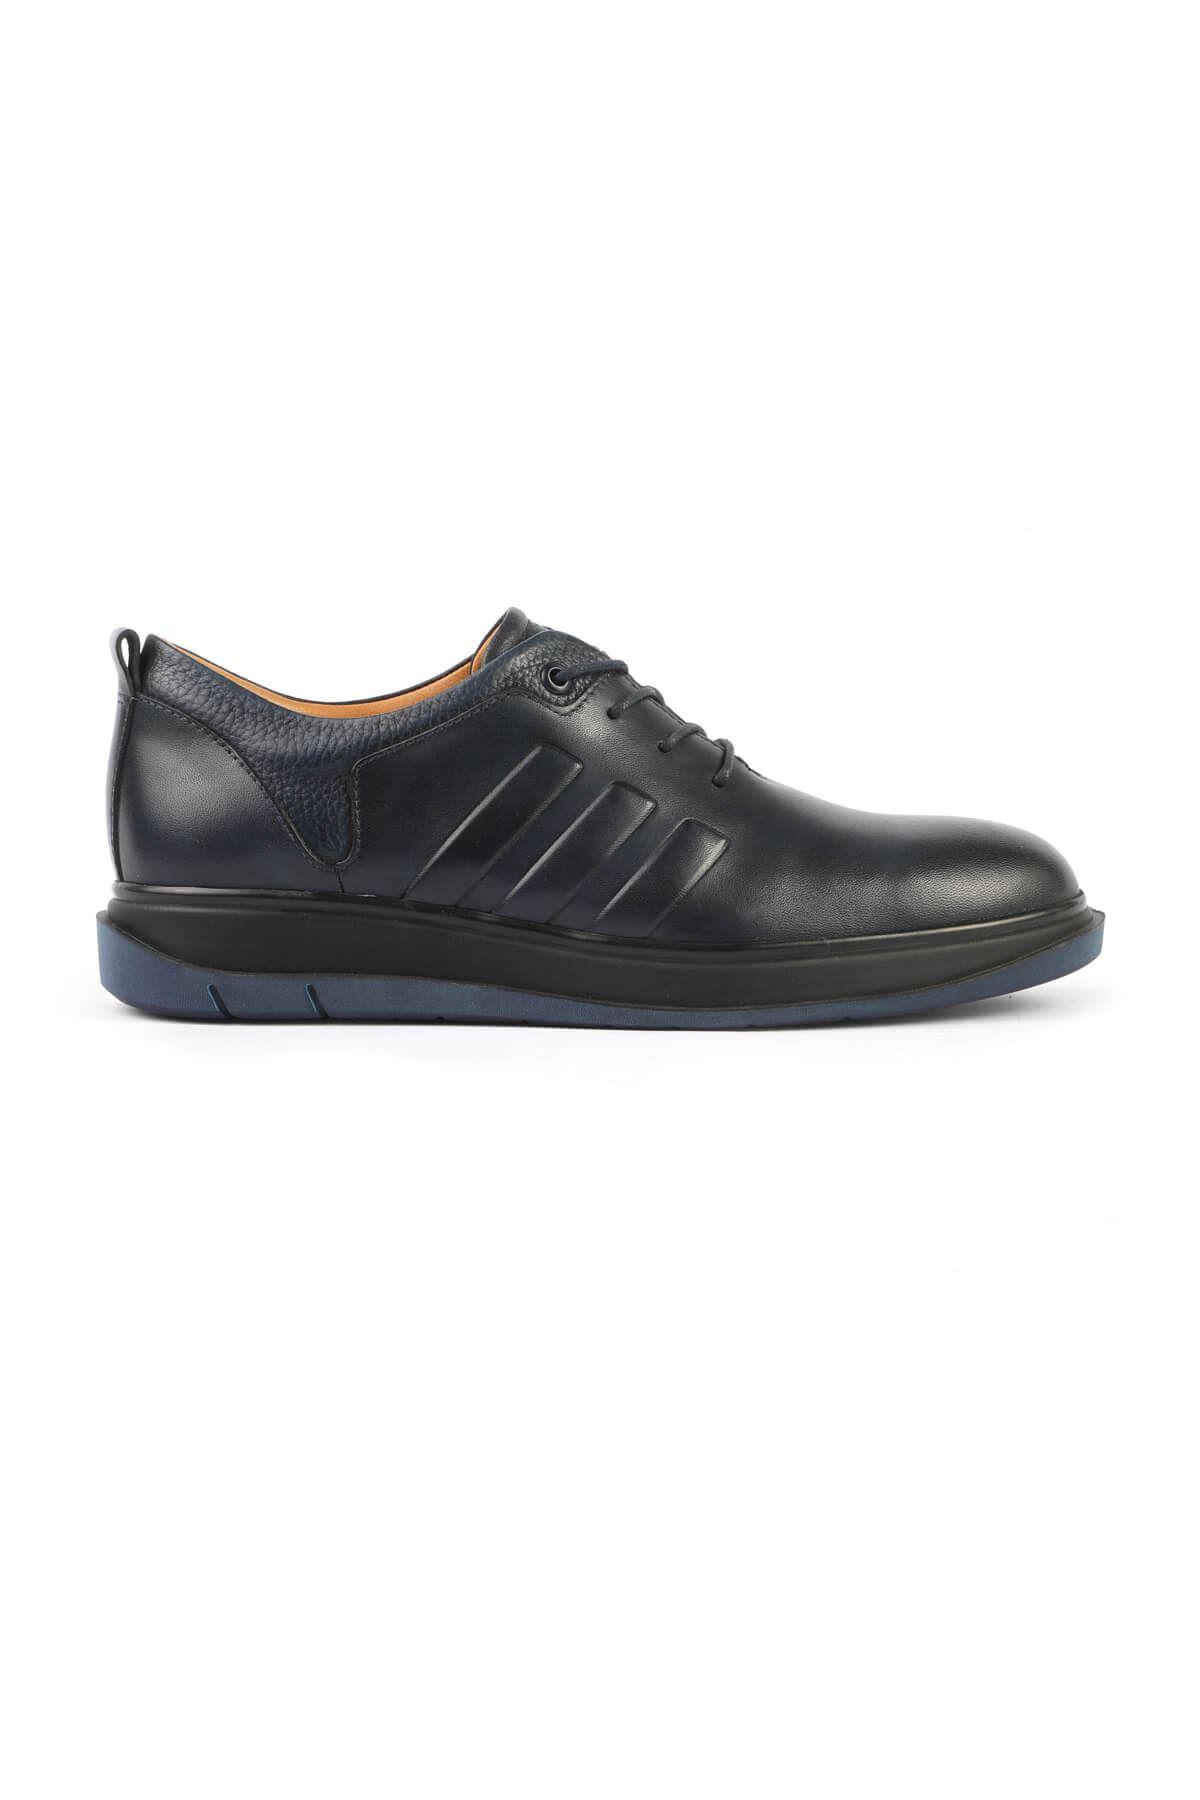 Libero 3163 Navy Blue Casual Shoes